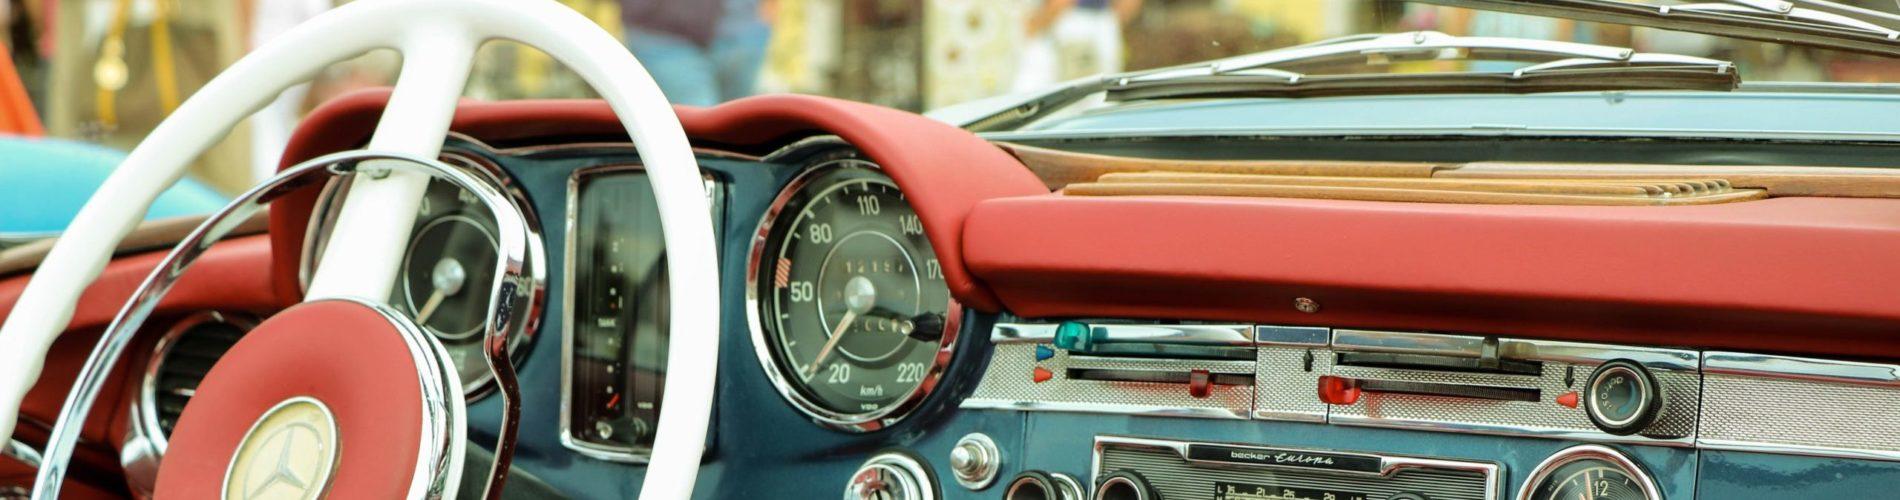 A photo of an older car steering wheel/dash